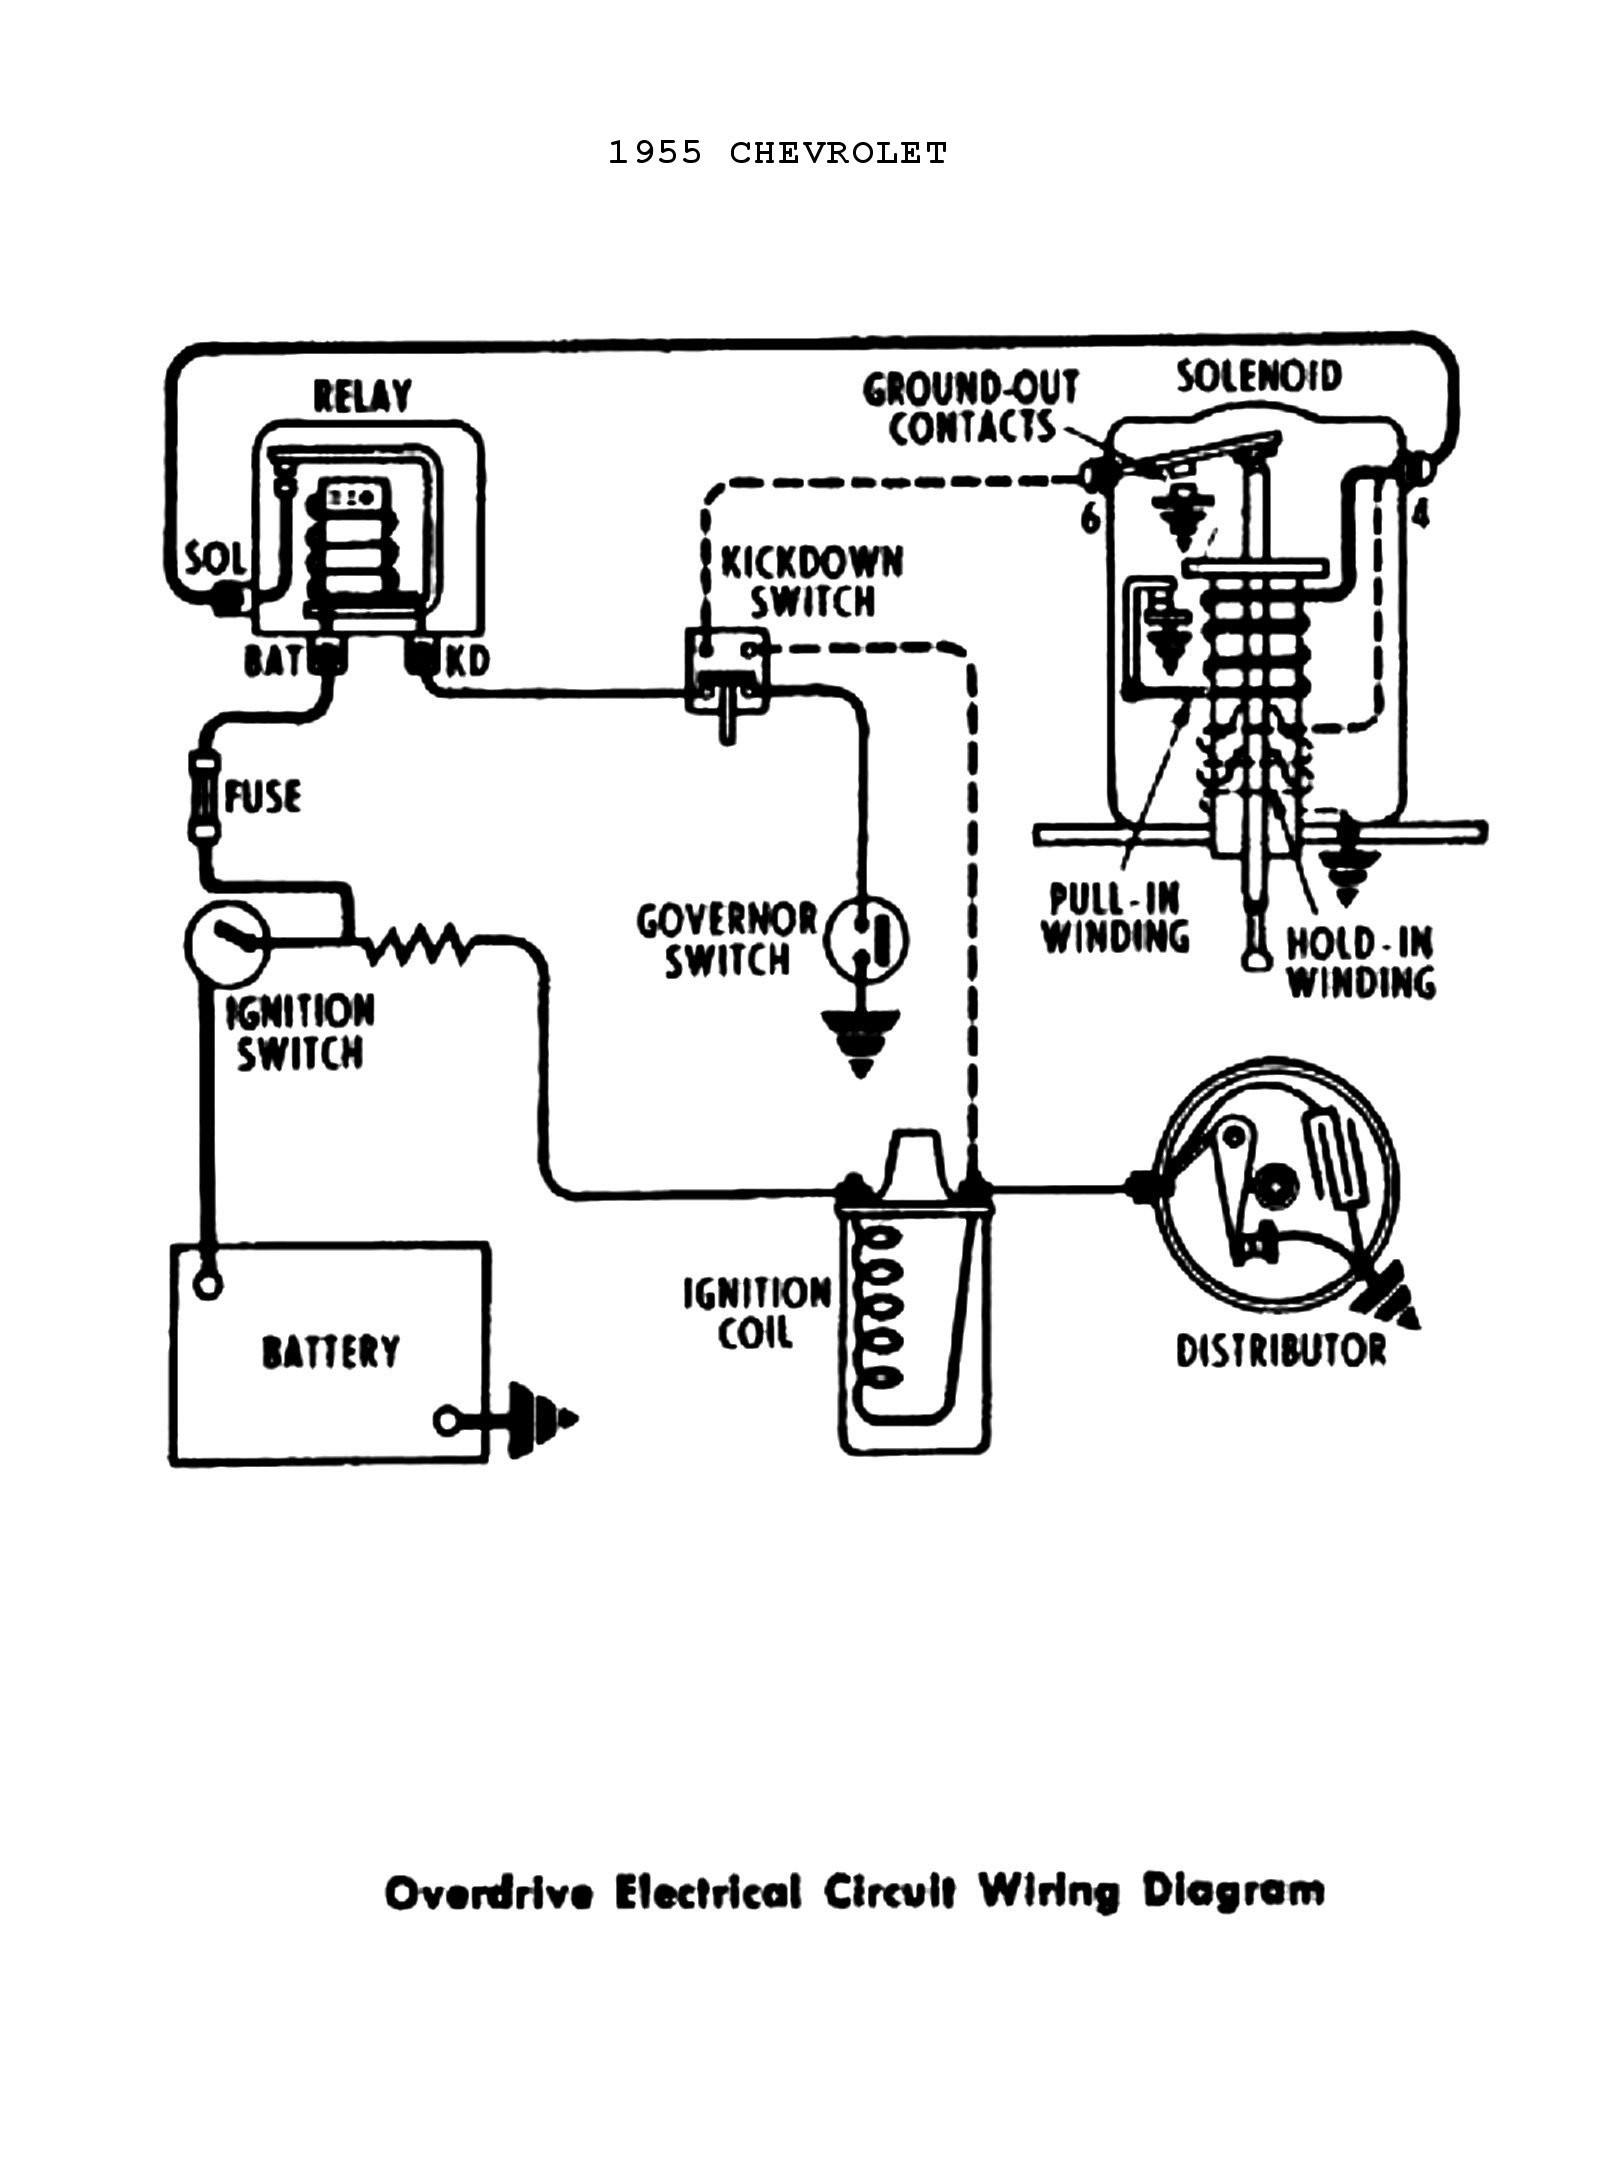 Chevy hei distributor wiring diagram chevy hei coil wiring diagram rh detoxicrecenze hei ignition coil